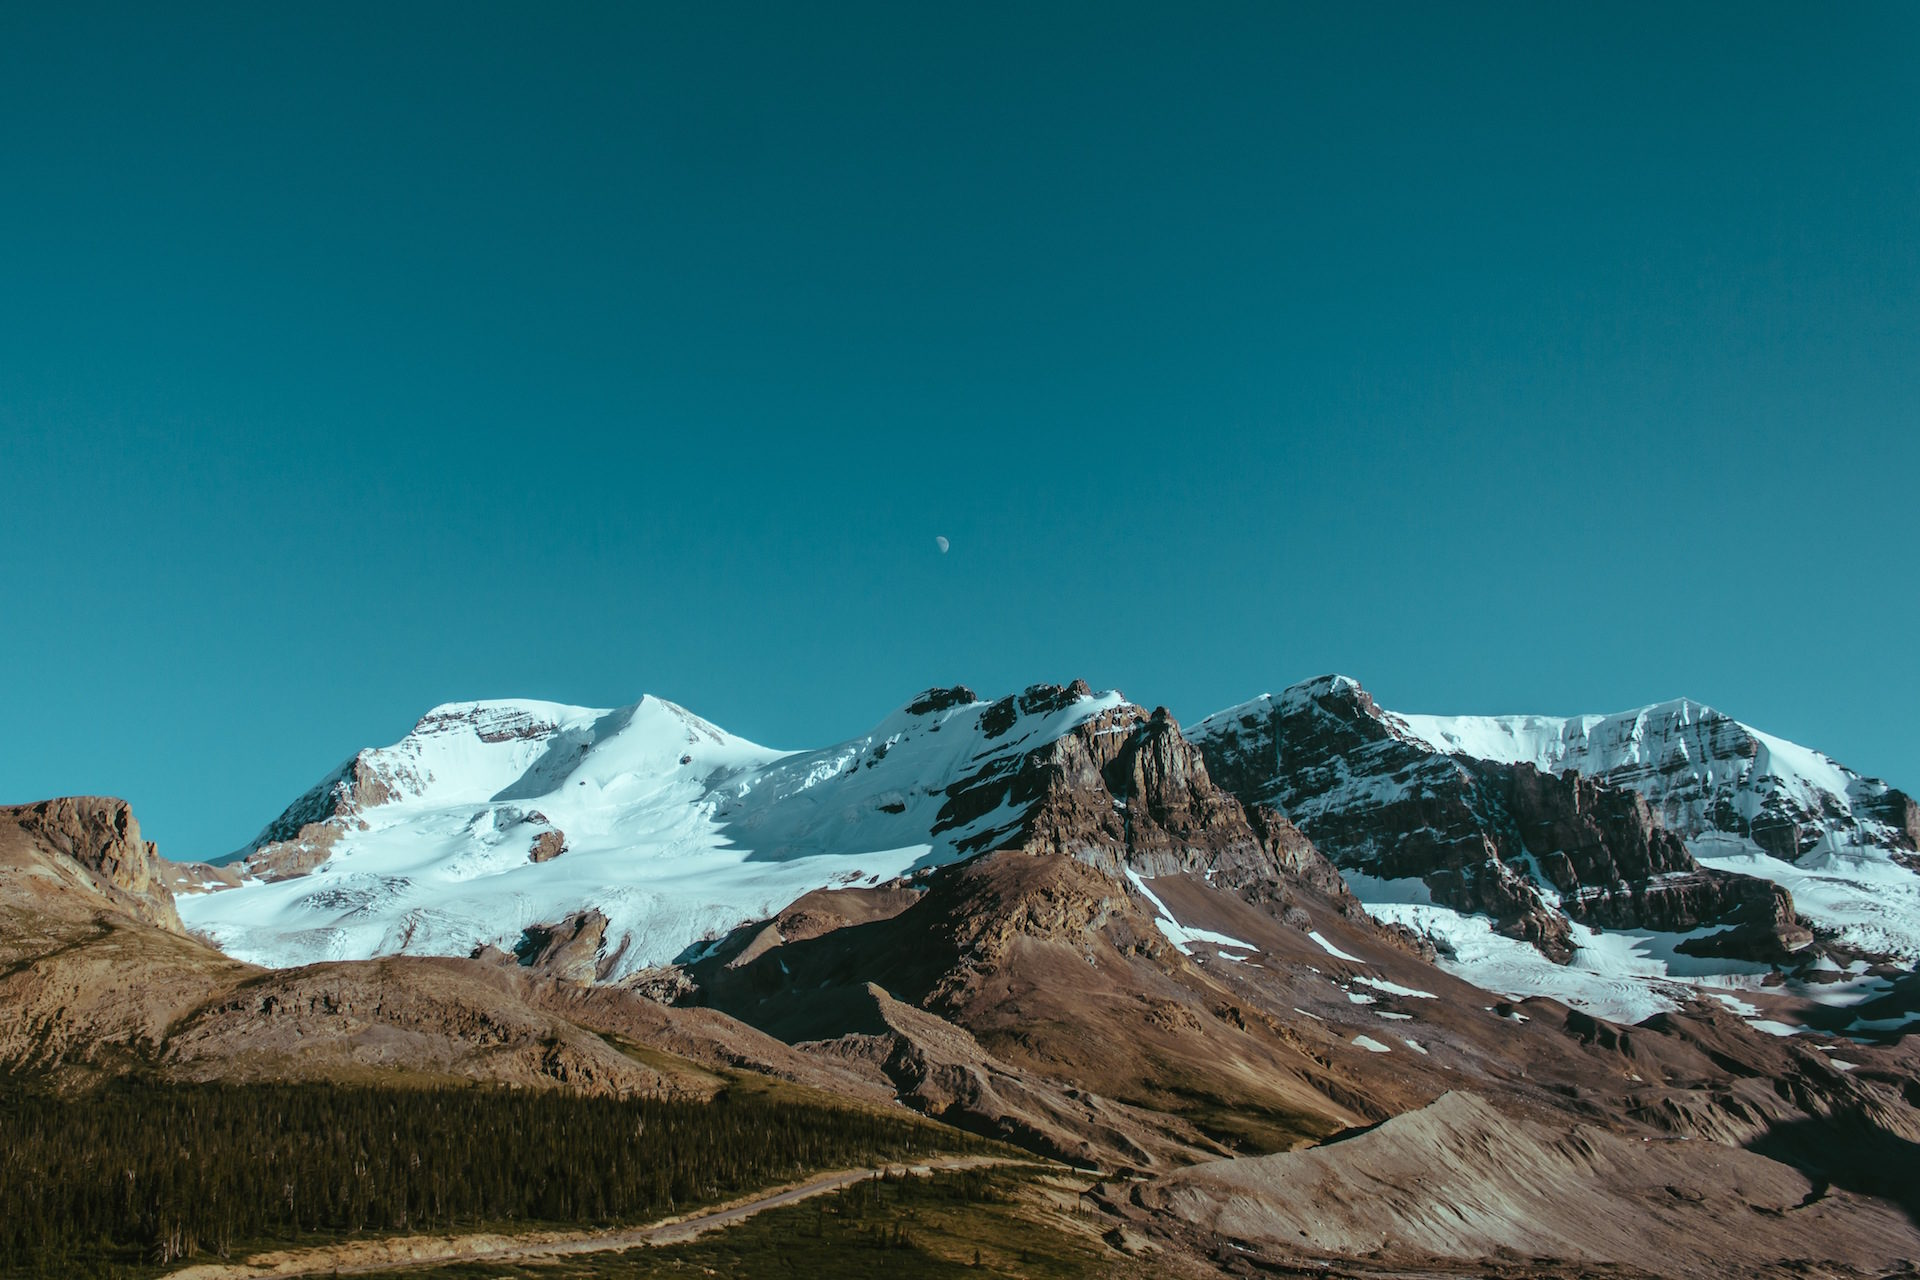 Montañas, neve, Cielo, Luna, Nevada - Sfondi HD - Professor-falken.com